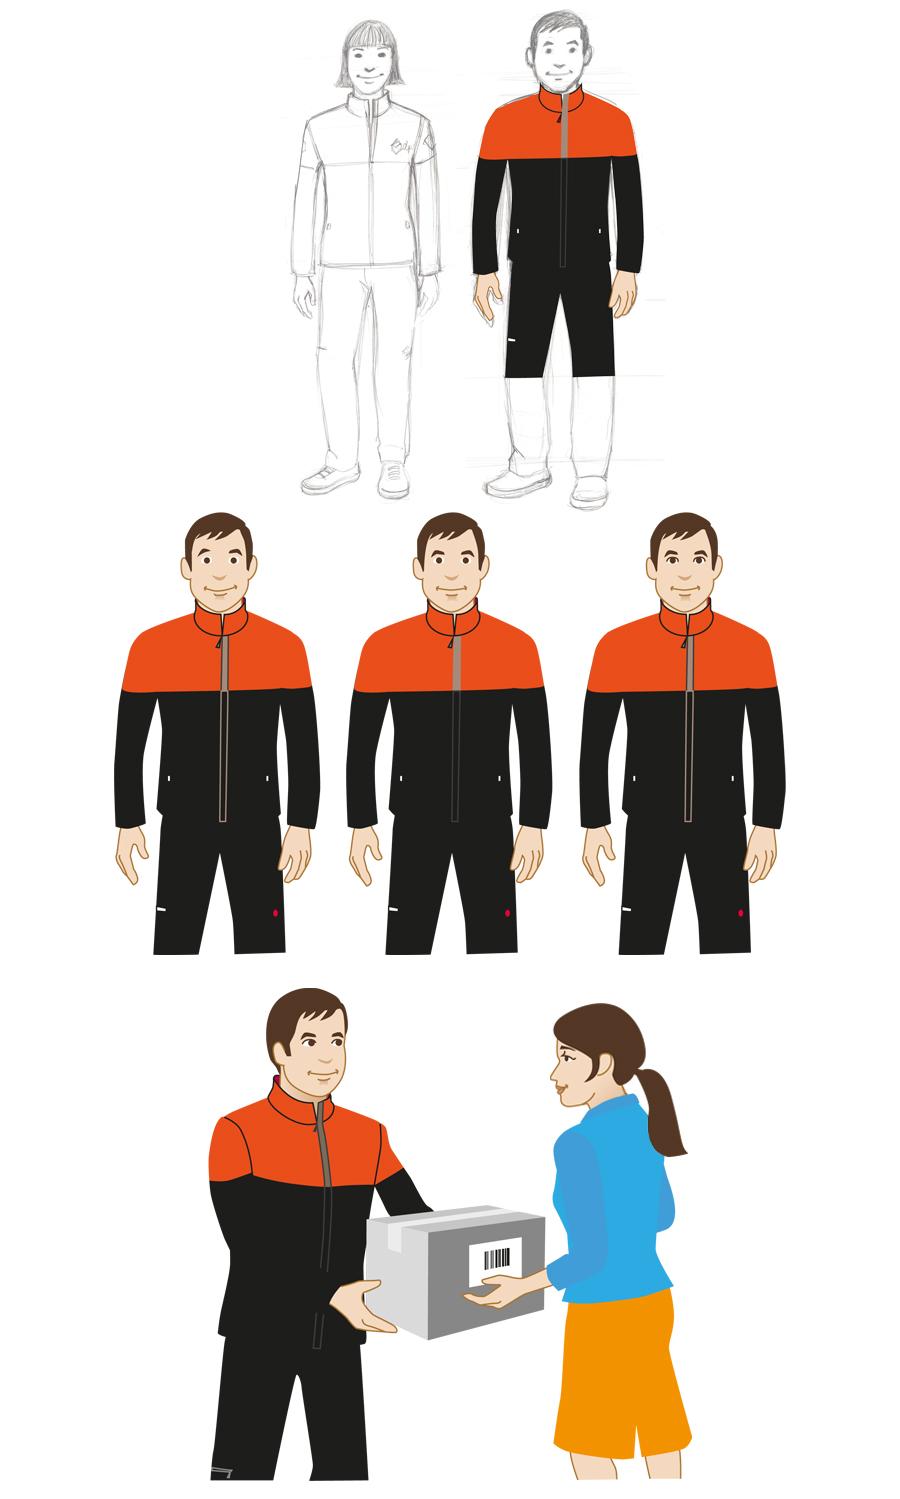 Character Character design Figur Sympathiefigur Dienstleister Illustration Sylvia Wolf